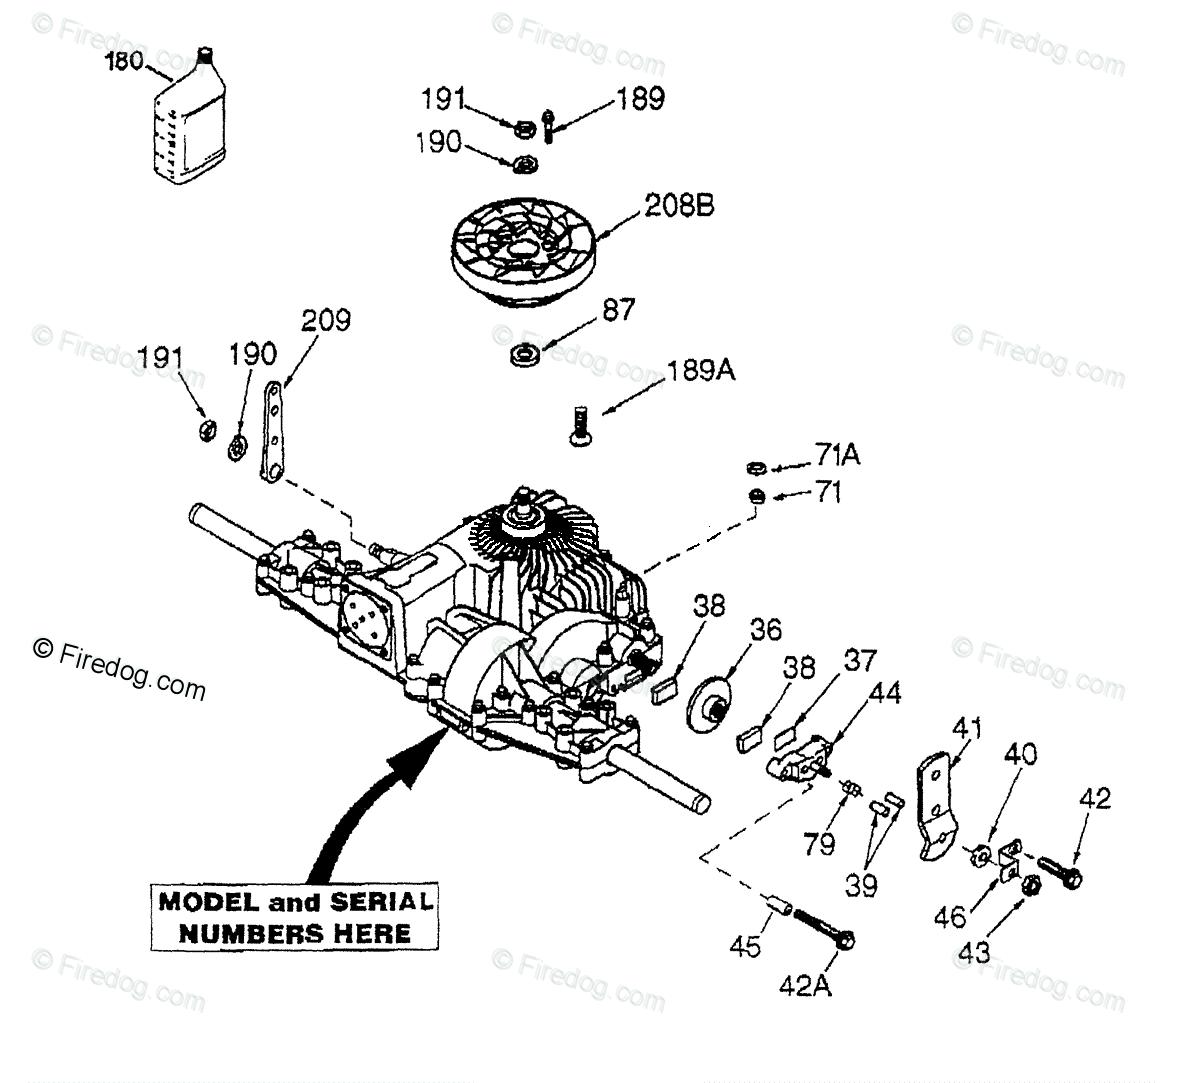 hight resolution of husqvarna ride mower yth 180 hcyth180c 954140010 1997 01 oem parts diagram for peerless transaxle model number 205 026b firedog com